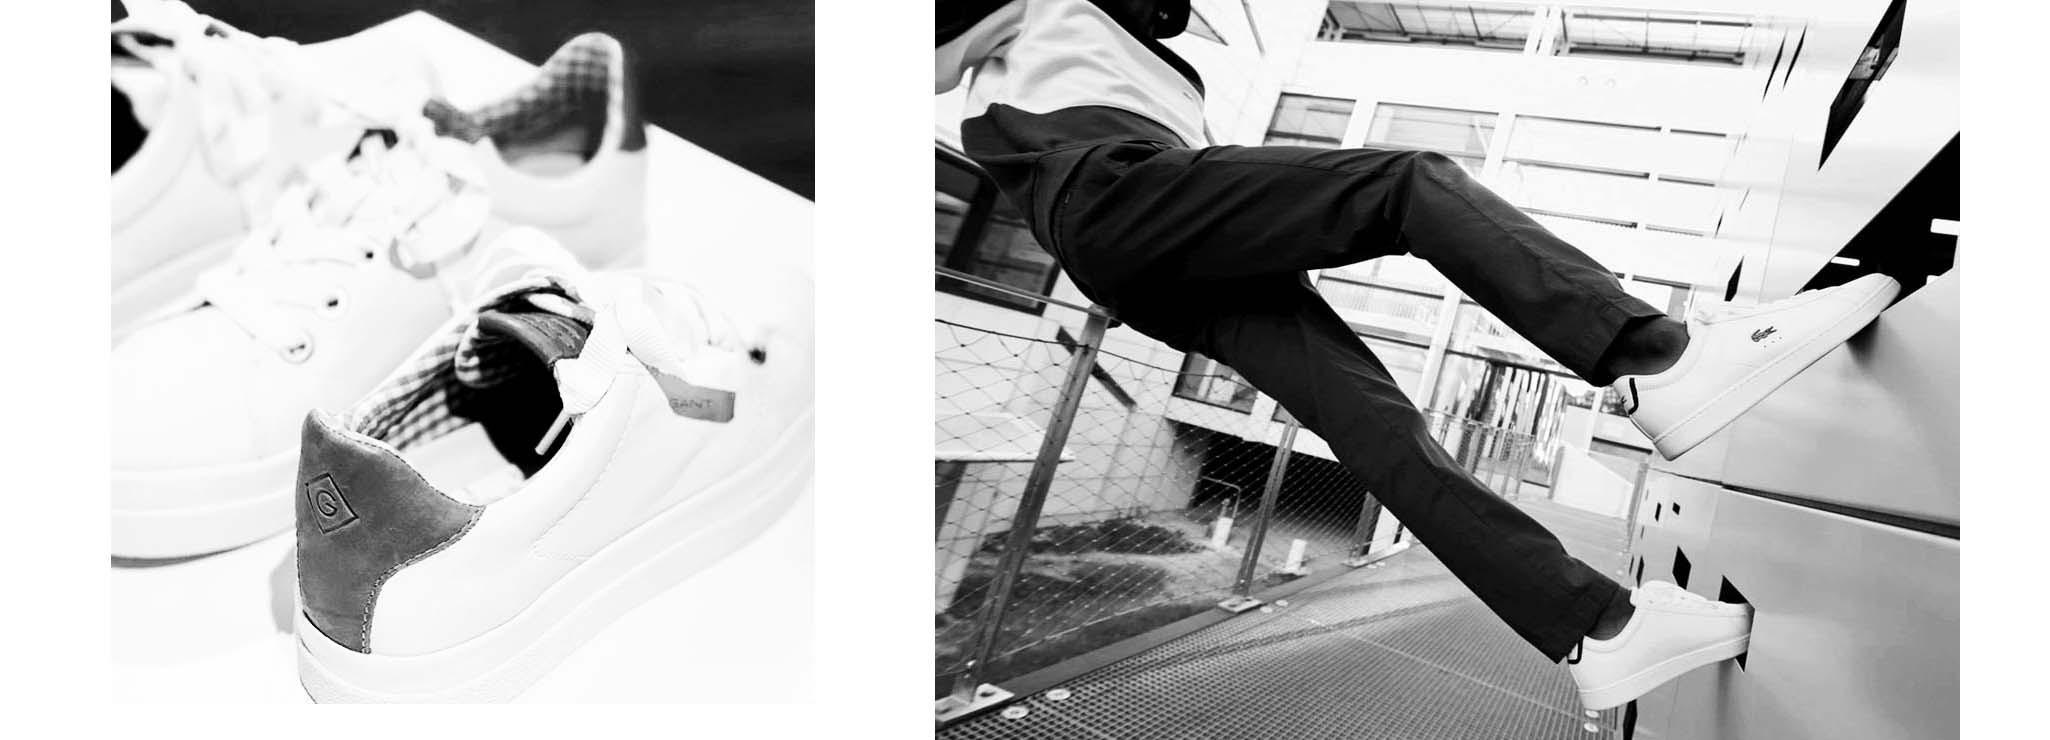 NipeShoes